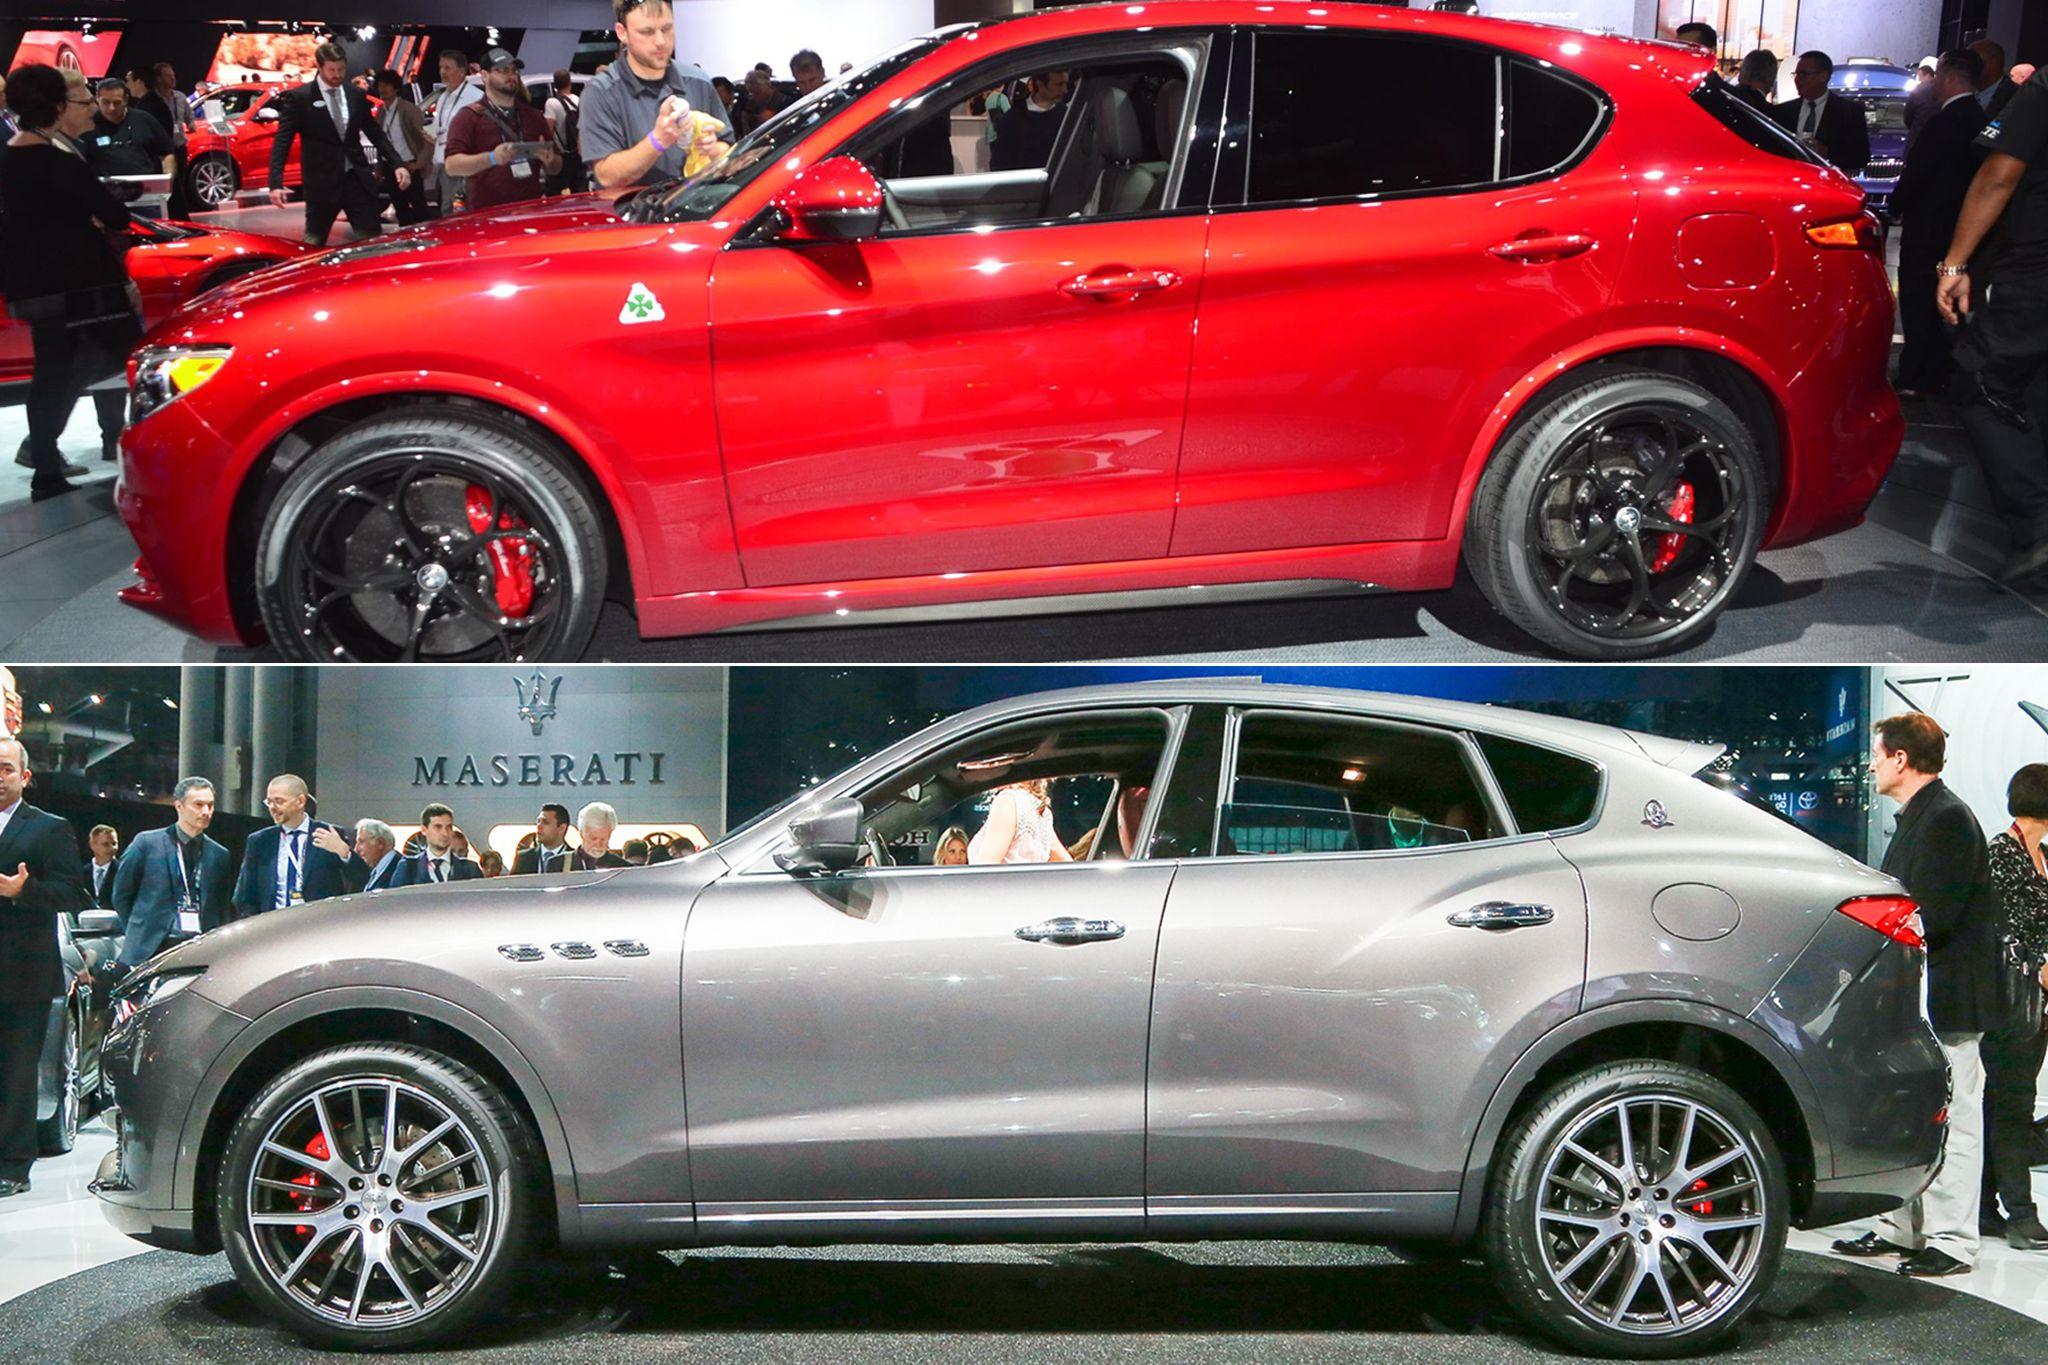 Italian SUV Auto-Showdown: Alfa Romeo Stelvio vs. Maserati Levante on giulietta and romeo, alpha romeo, ver videos de romeo, alpine romeo, marseille romeo, things that describe romeo, uggs on sale men's romeo,